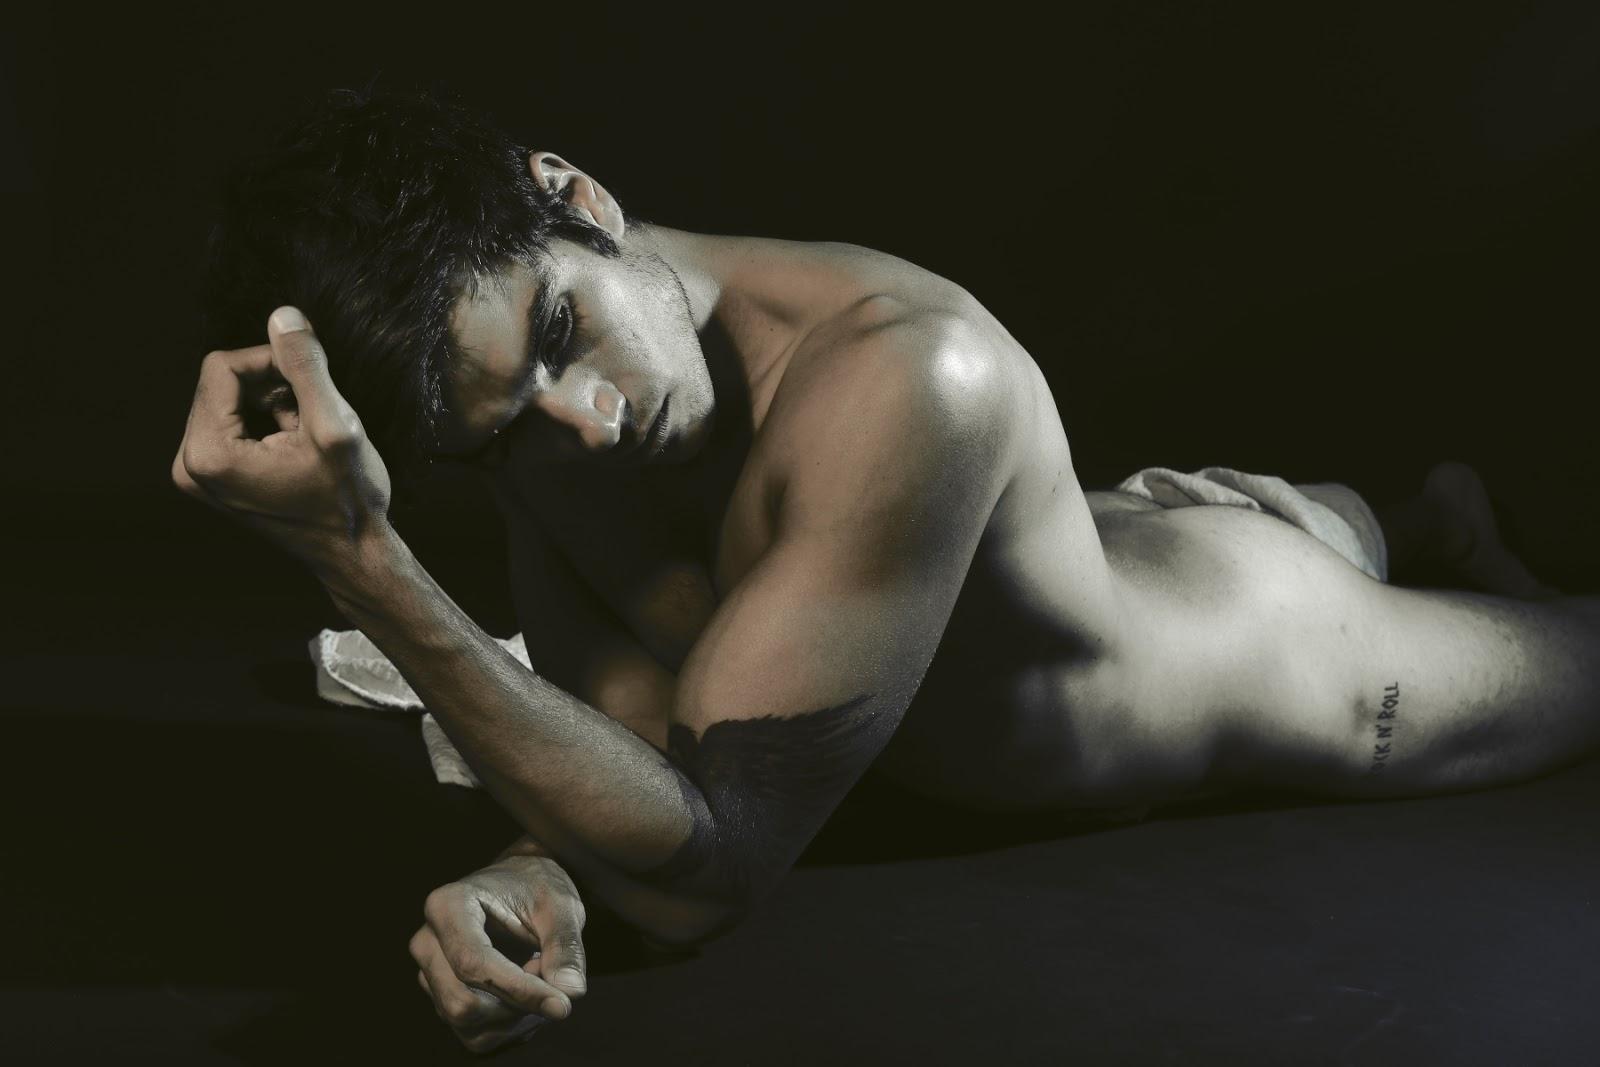 Kauê Machado by Kemal Dedecan for Brazilian Male Model